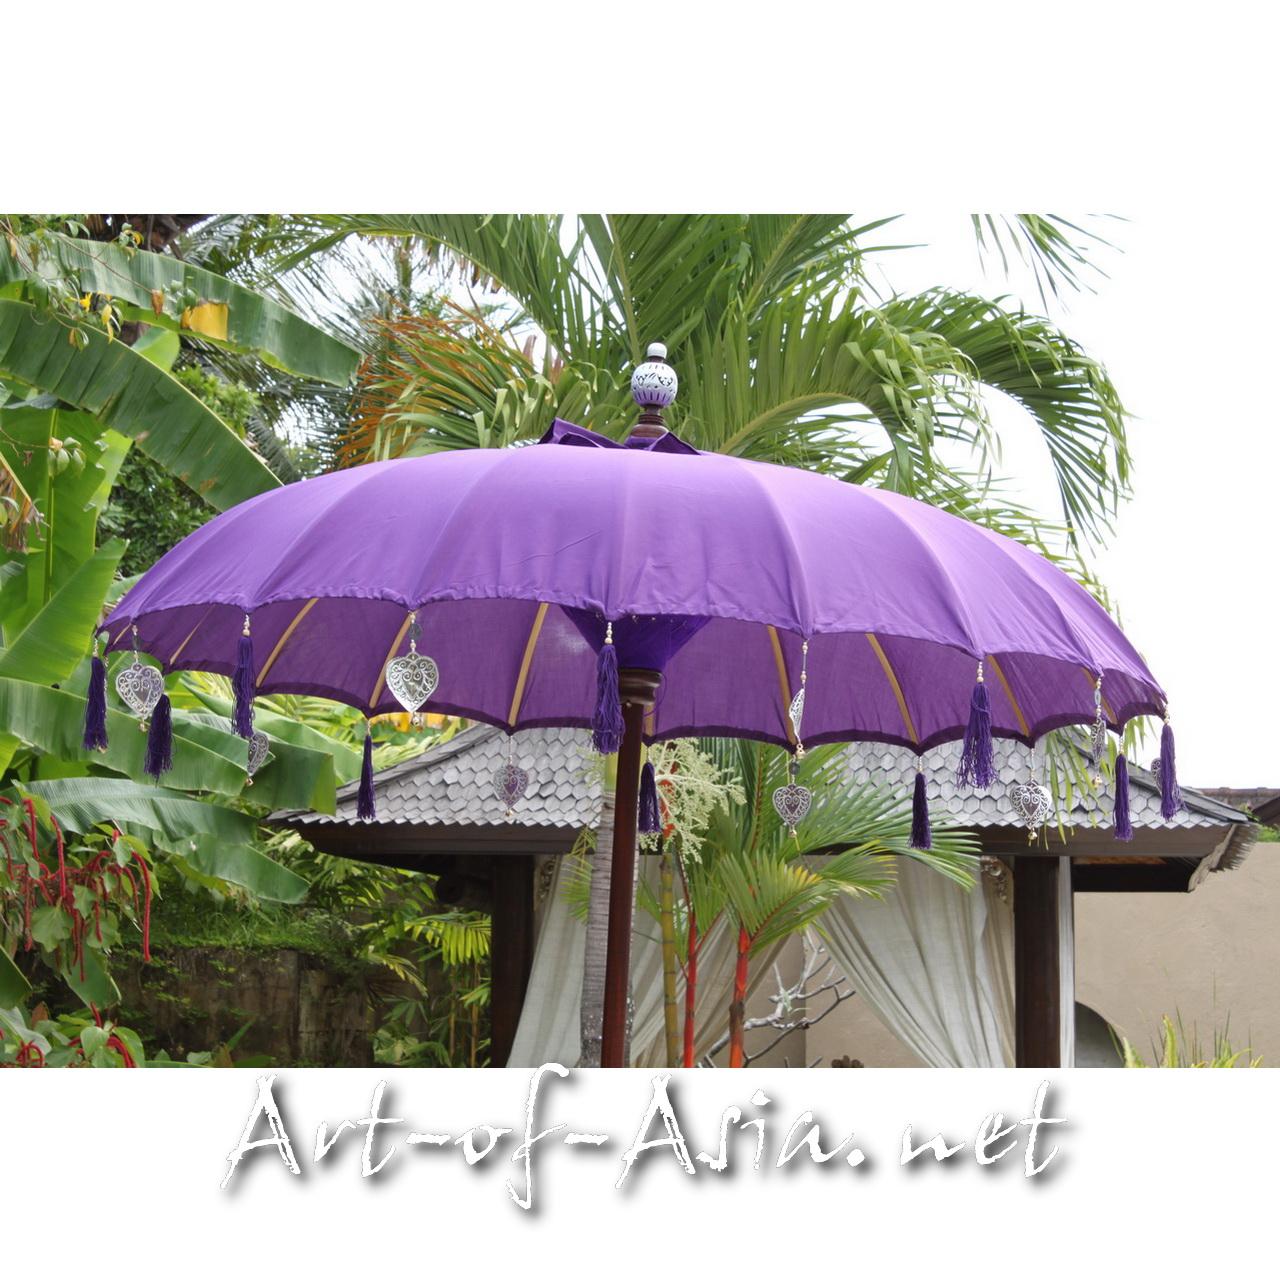 bali sonnenschirm 180cm royal purple silber 180cm durchmesser sonnenschirme. Black Bedroom Furniture Sets. Home Design Ideas